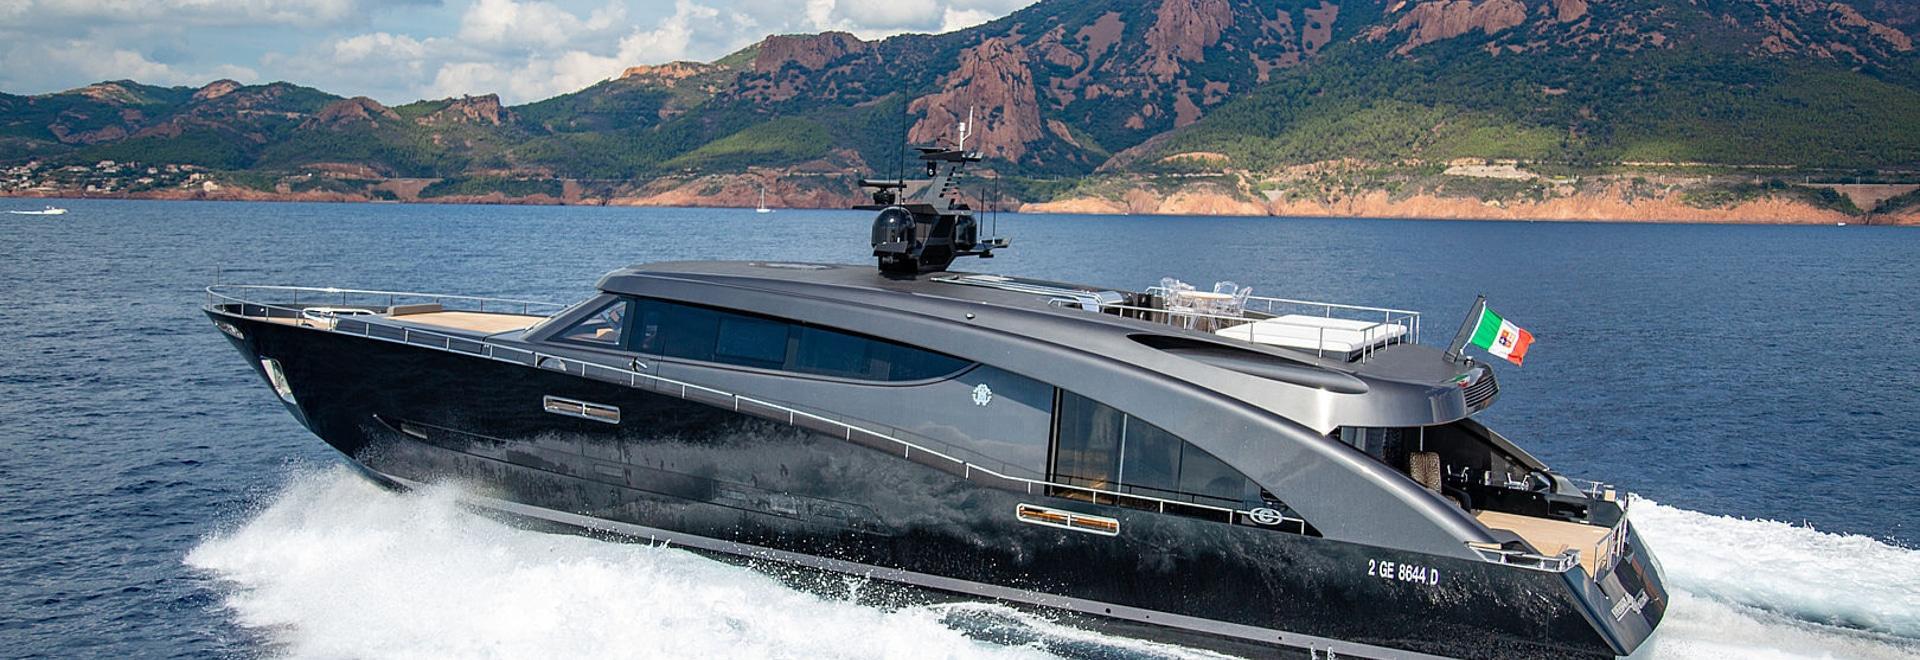 A bordo de la libertad del yate de los 28m de Roberto Cavalli